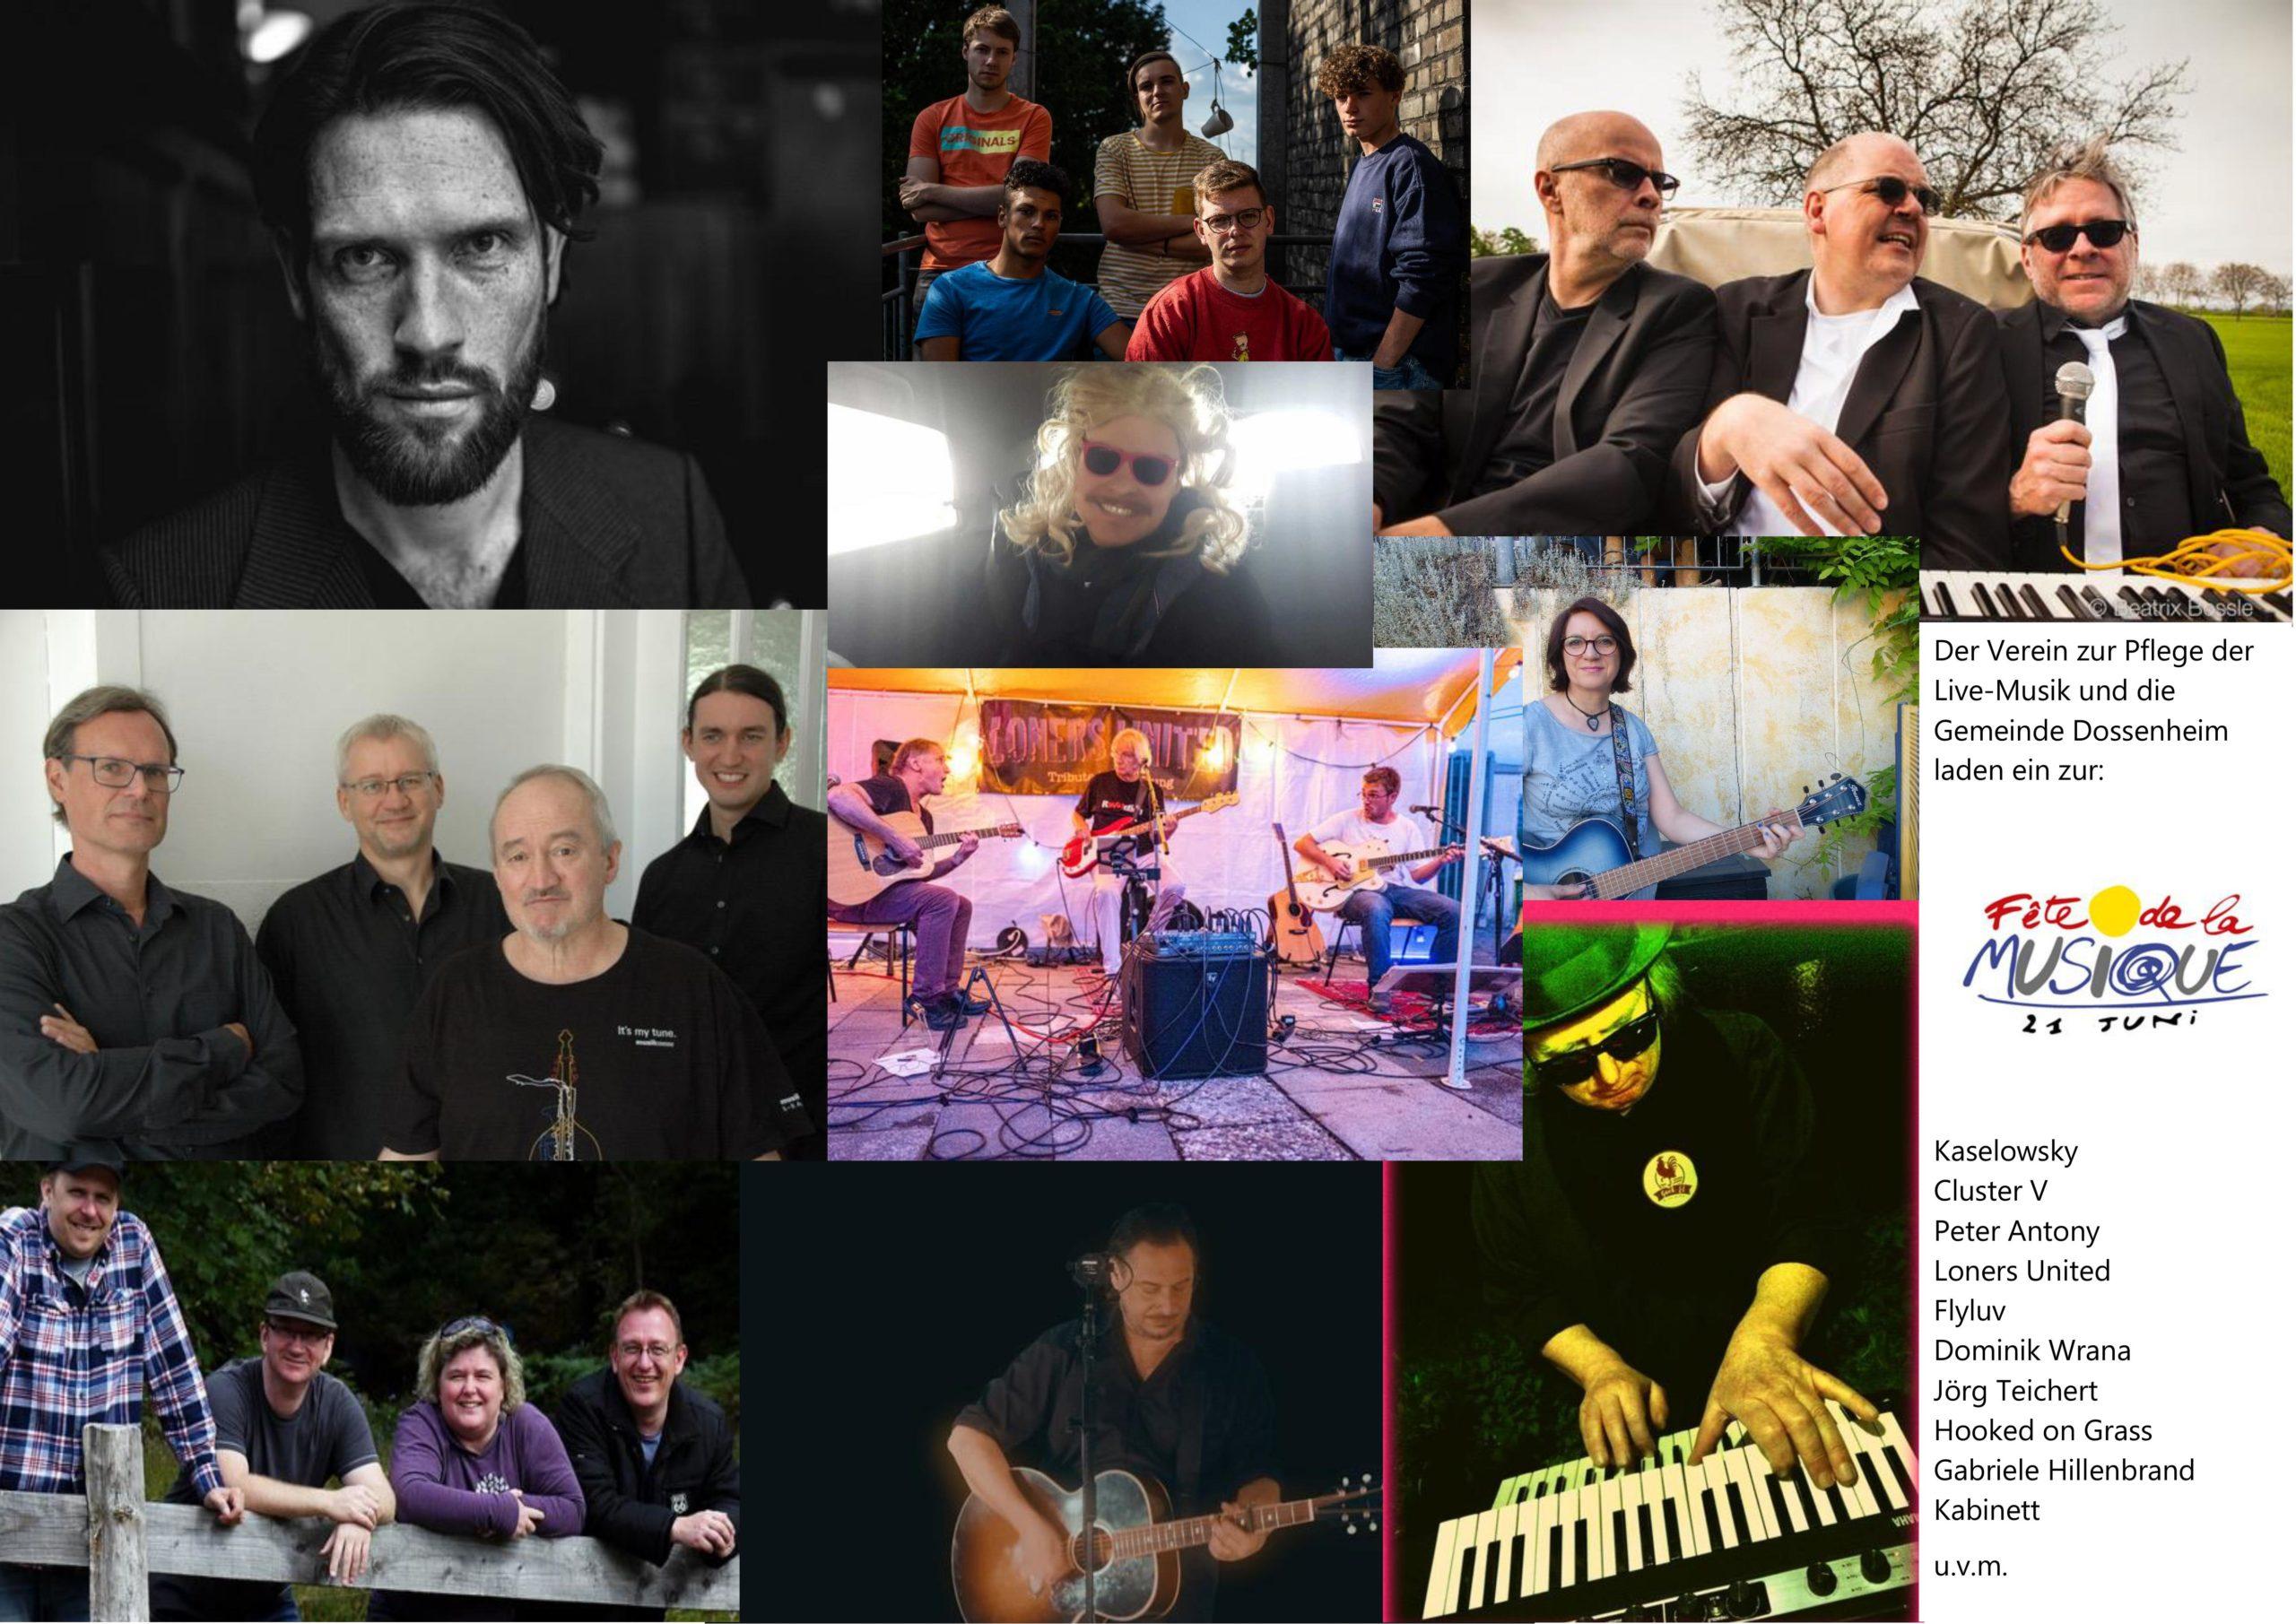 Fête de la Musique in Dossenheim